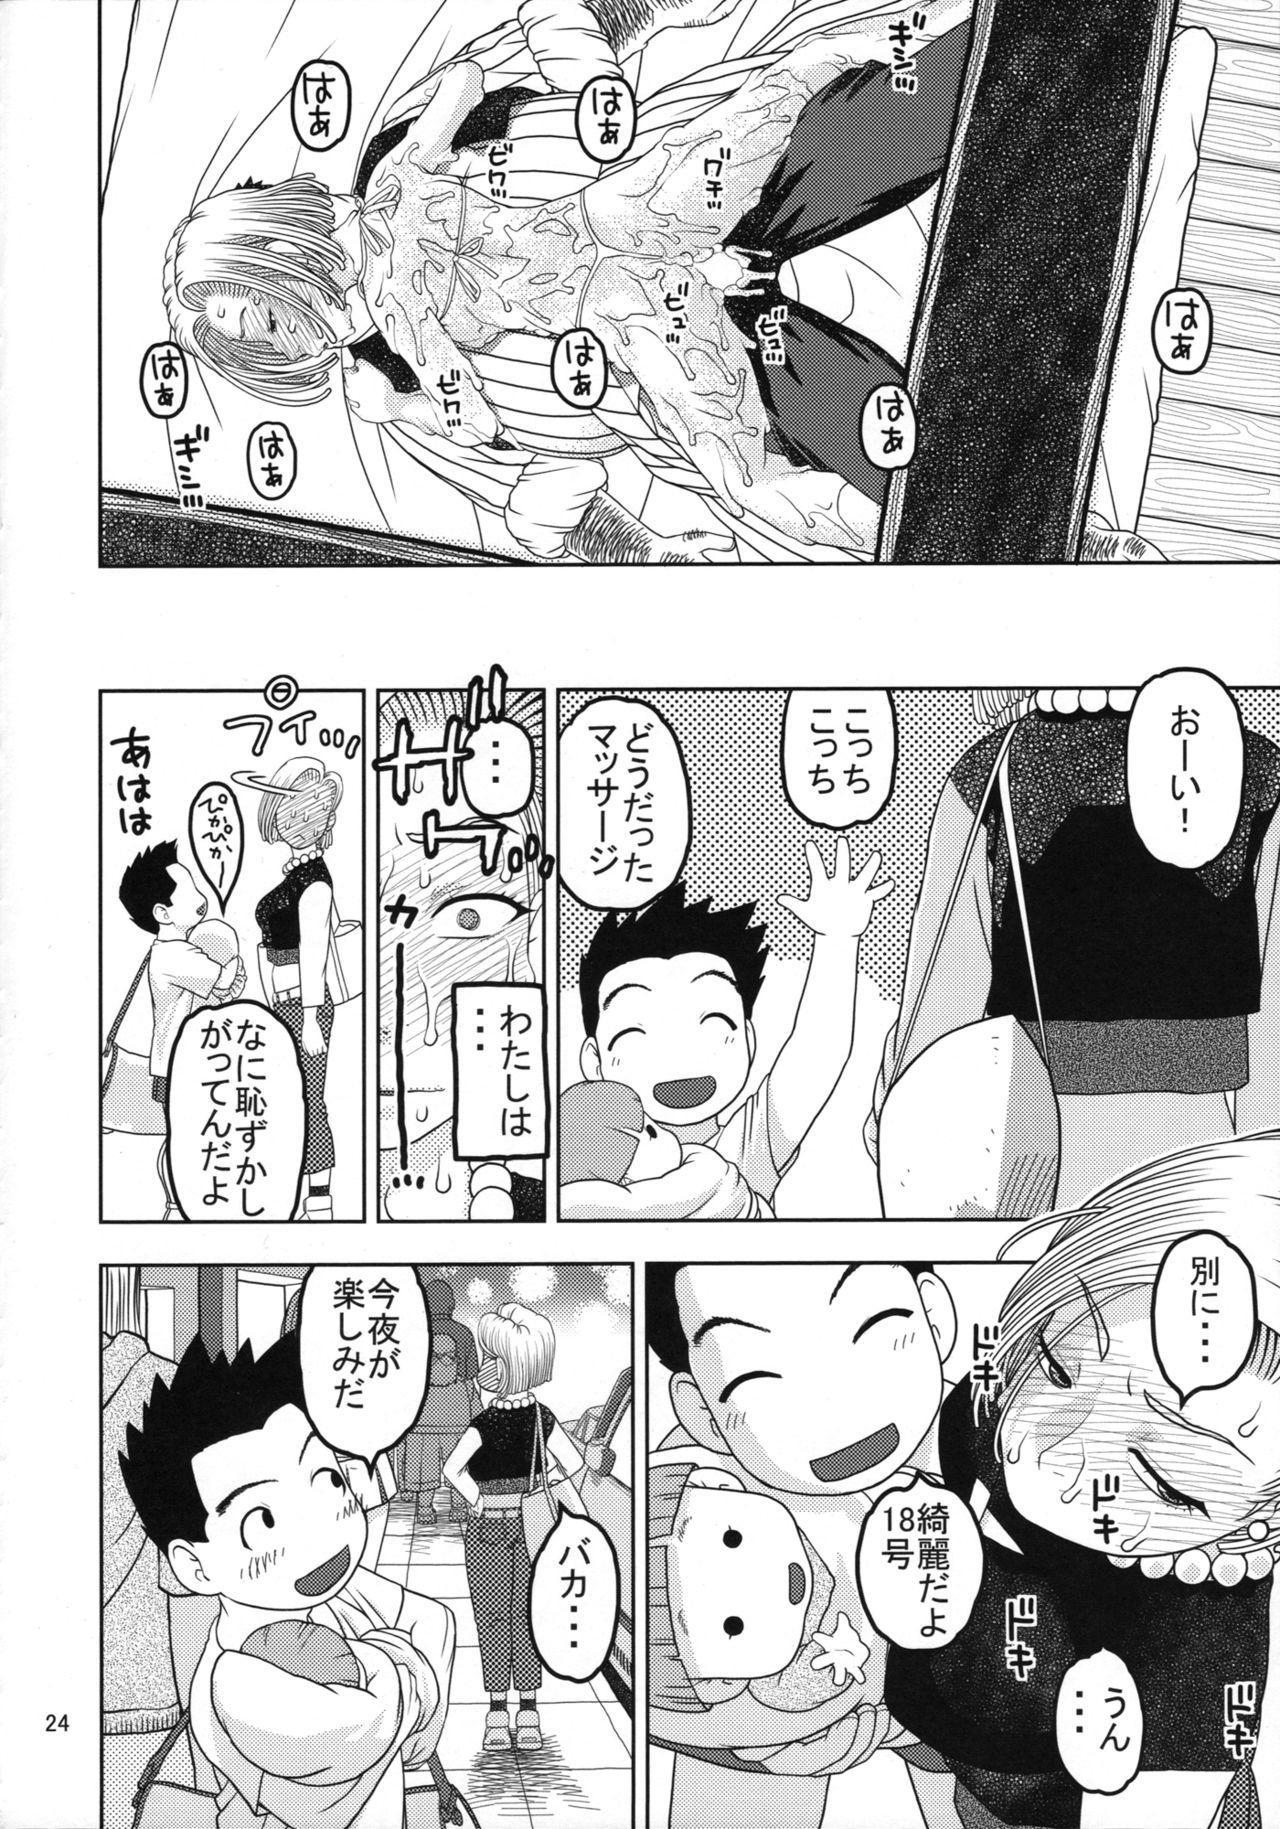 18-gou to Oil Massage de Seikou 22